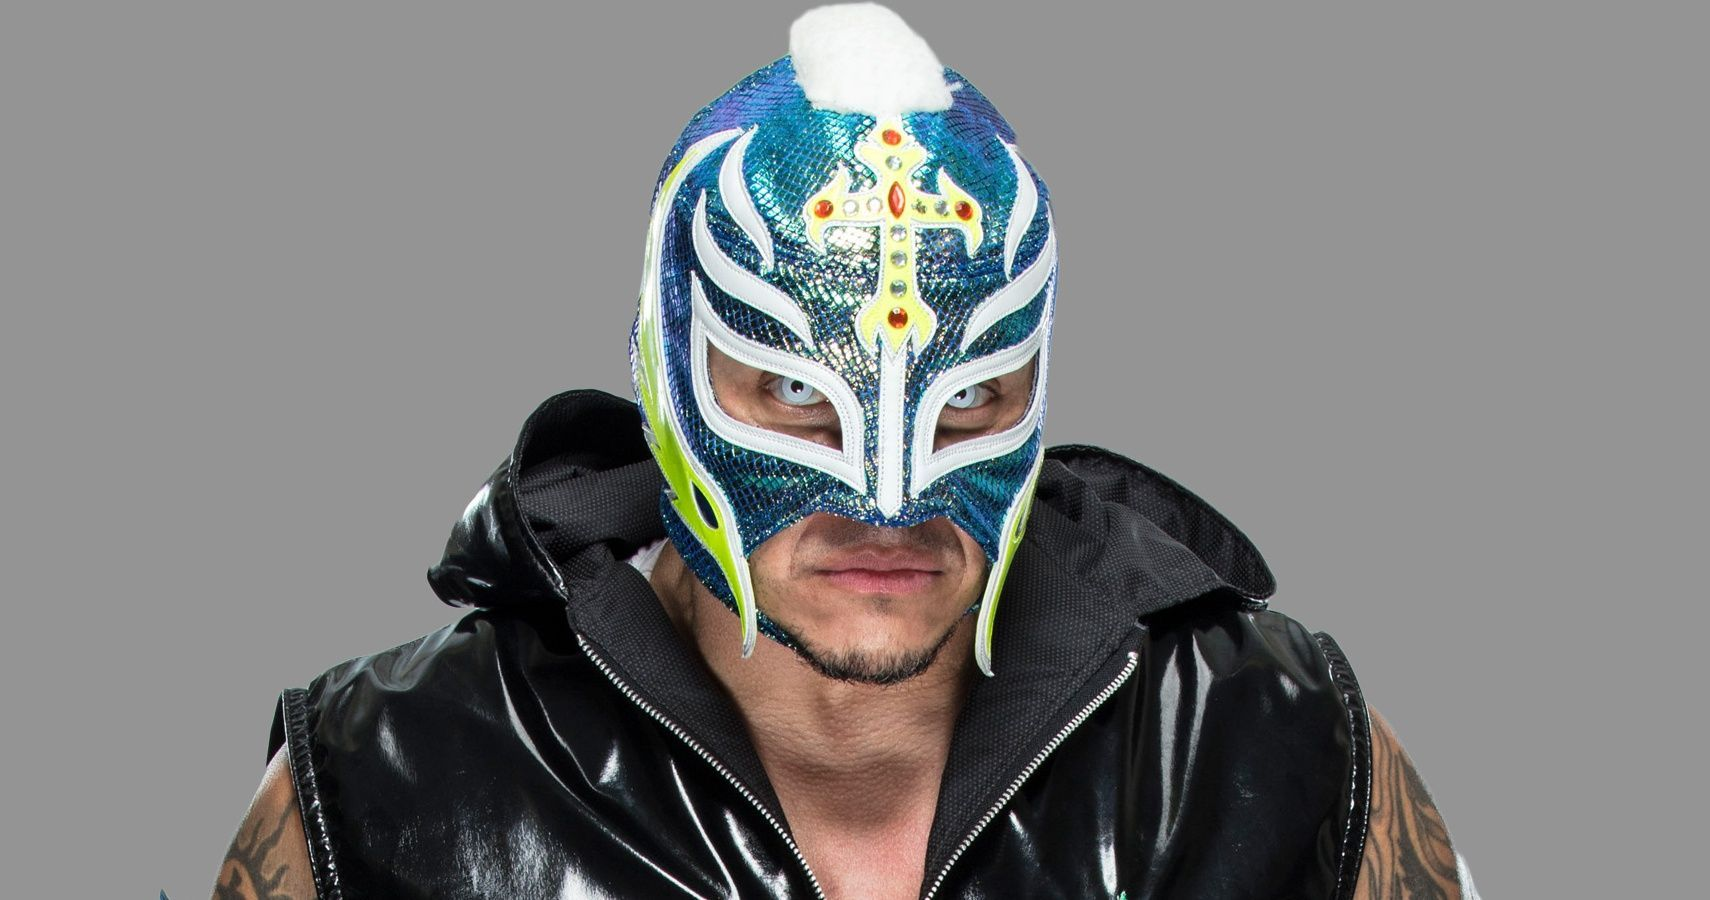 Rey Mysterio Dominic Gutierrez